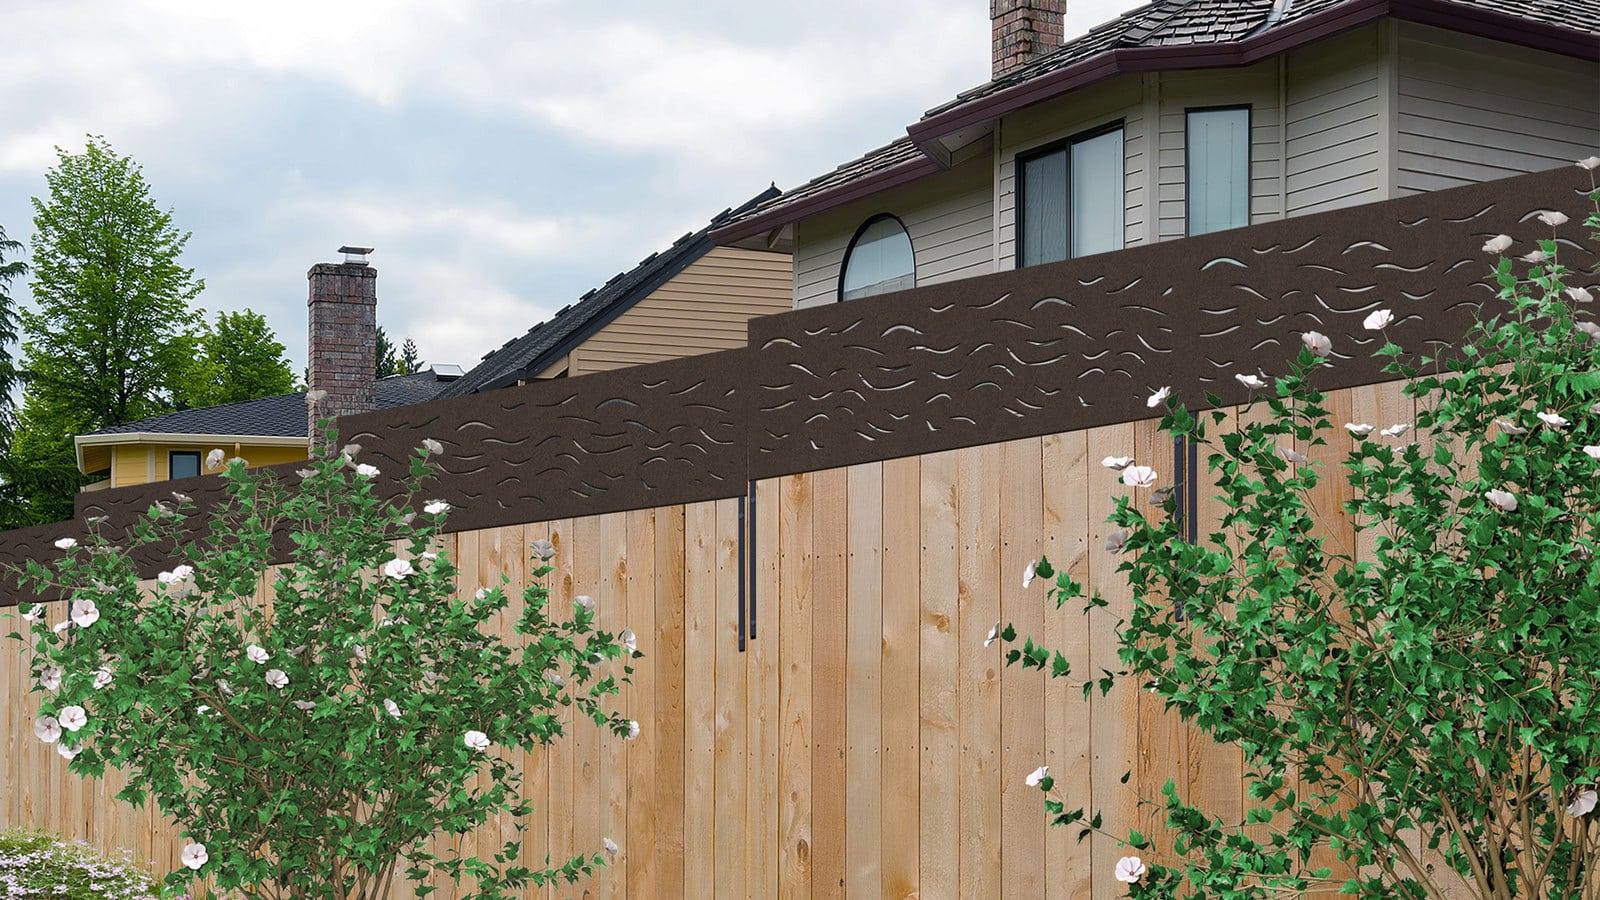 Modinex VIBE panel installed on backyard fence